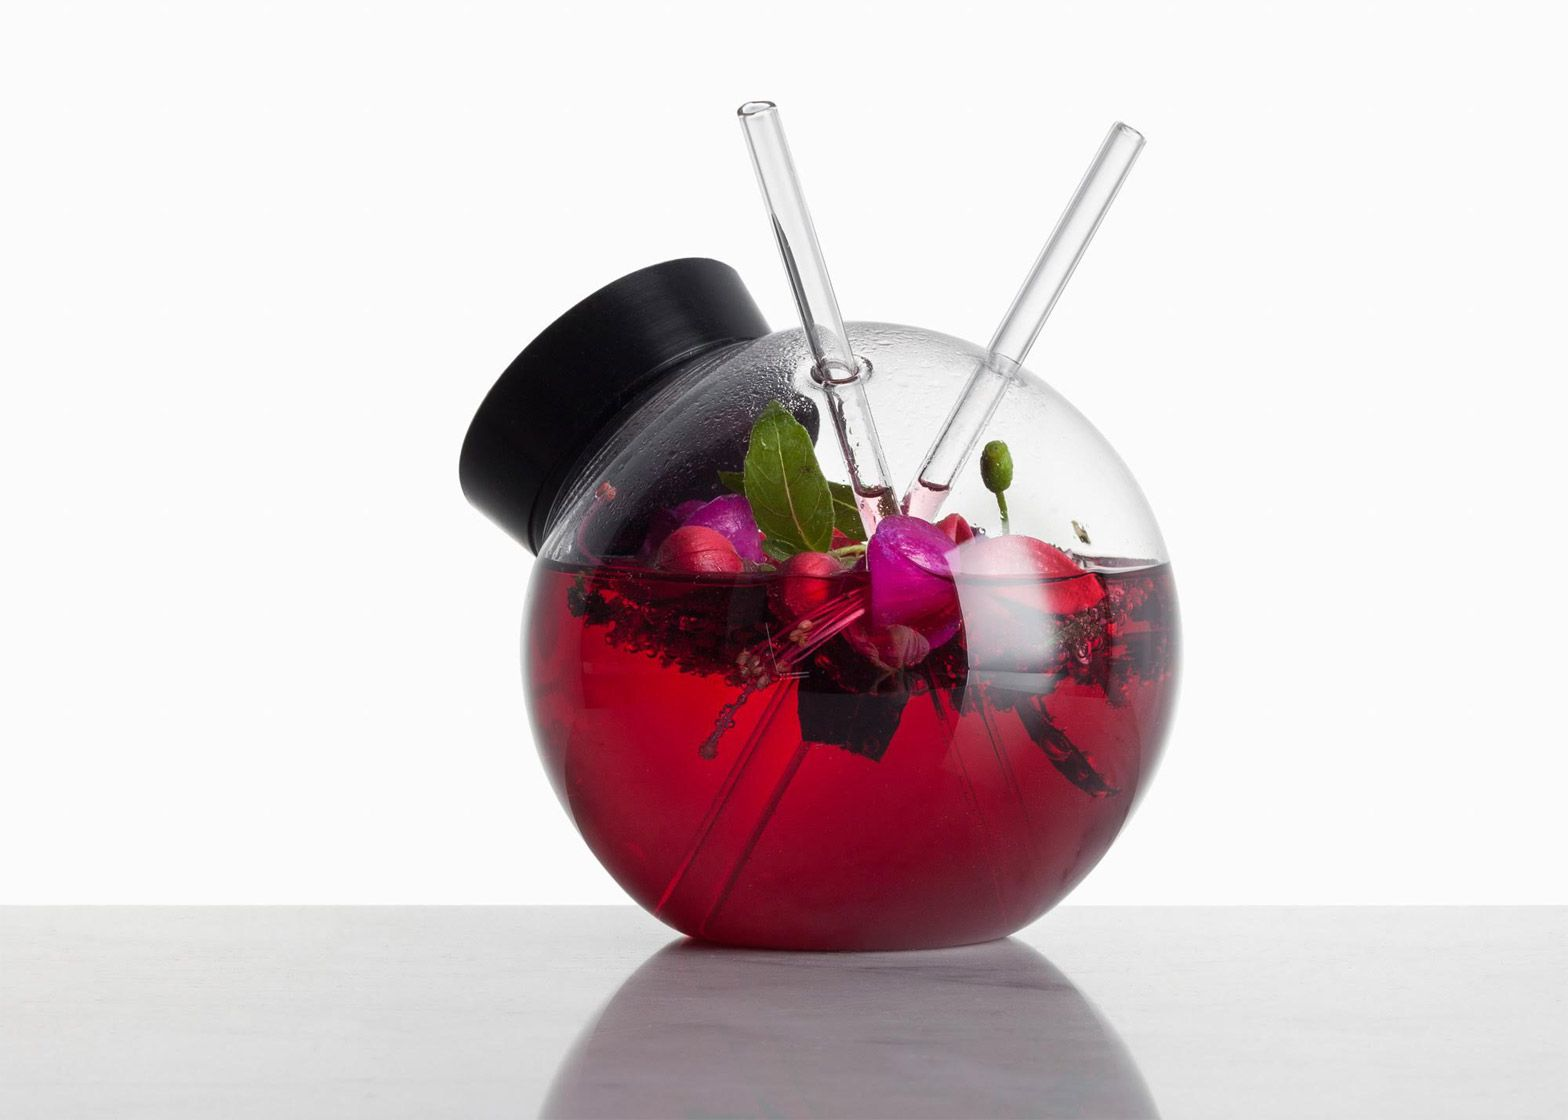 Martin Jakobsen Designs Spherical Quido Cocktail Glass Cocktail Glass Wine Glass Designs Handblown Glassware